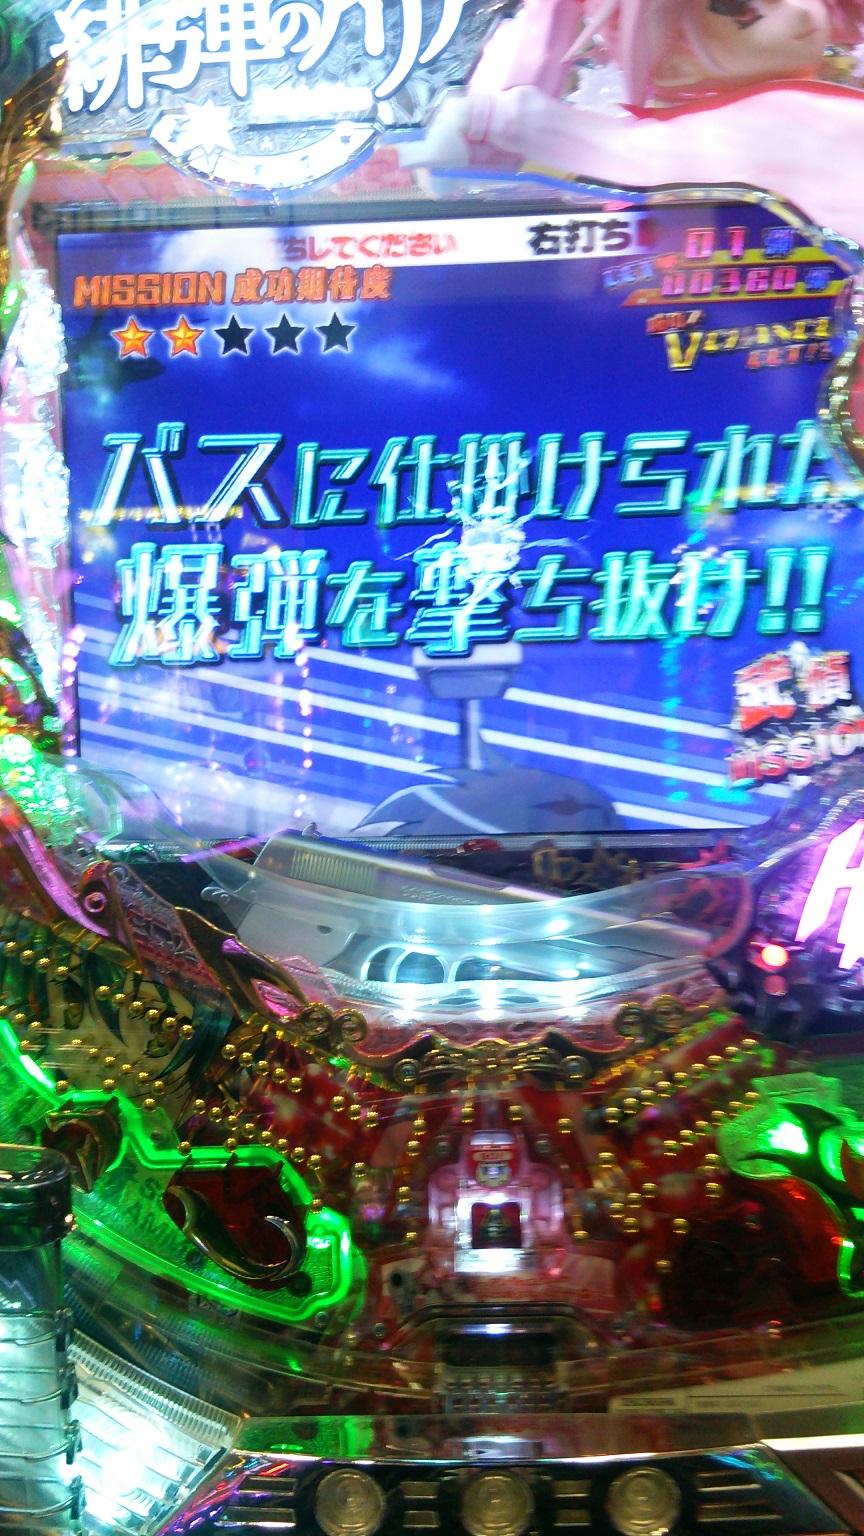 DSC_0451_201411201824520a6.jpg